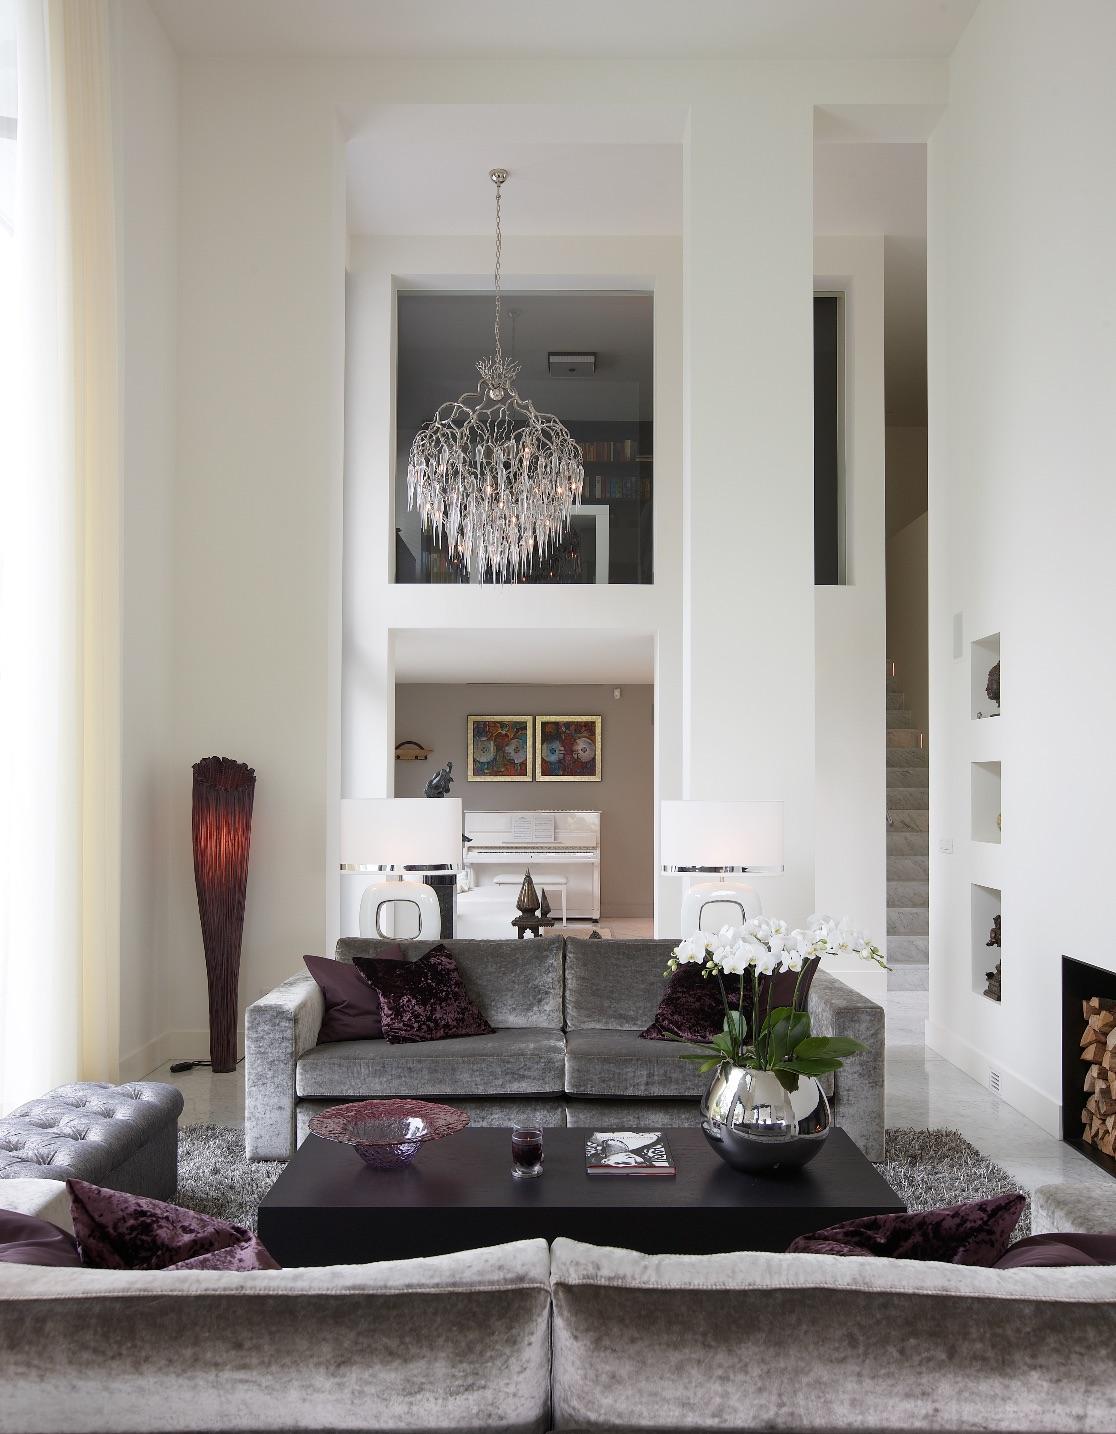 BrandvanEgmond-hollywood-icicles-by-collection-interior-VlassakVerhulst